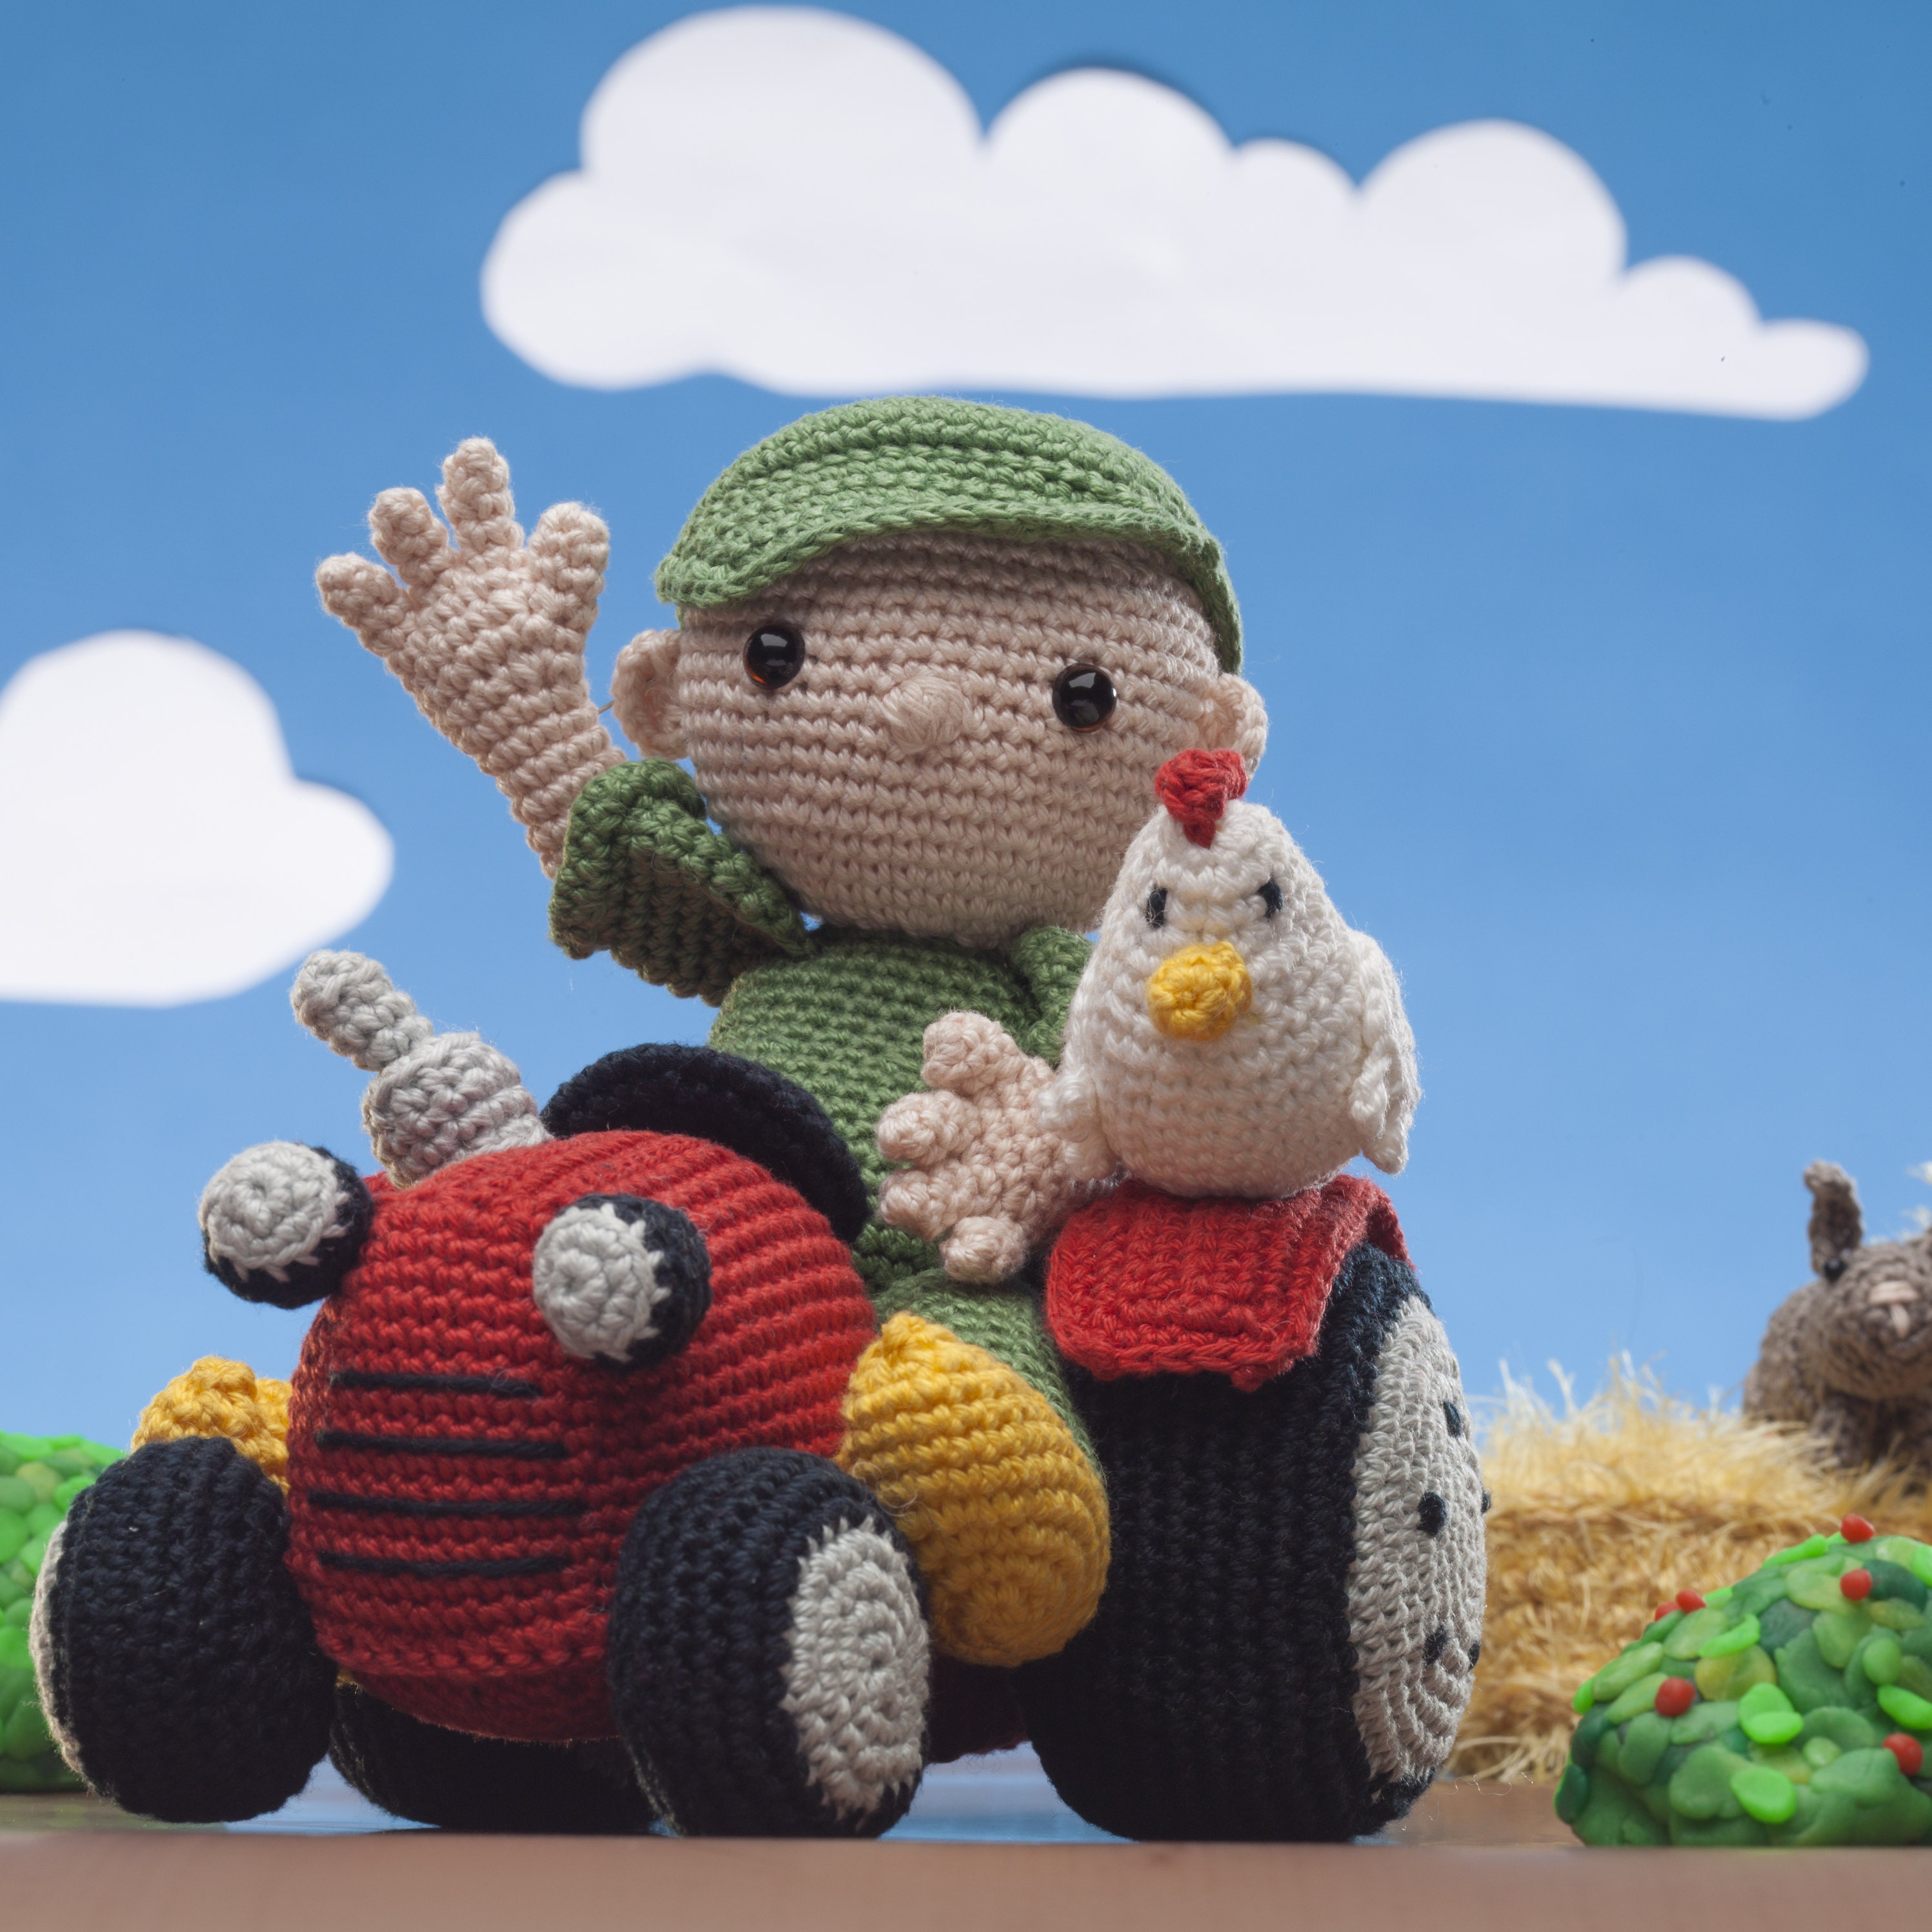 Crochet Patterns By Christel Krukkert By Amigurumisnl On Etsy